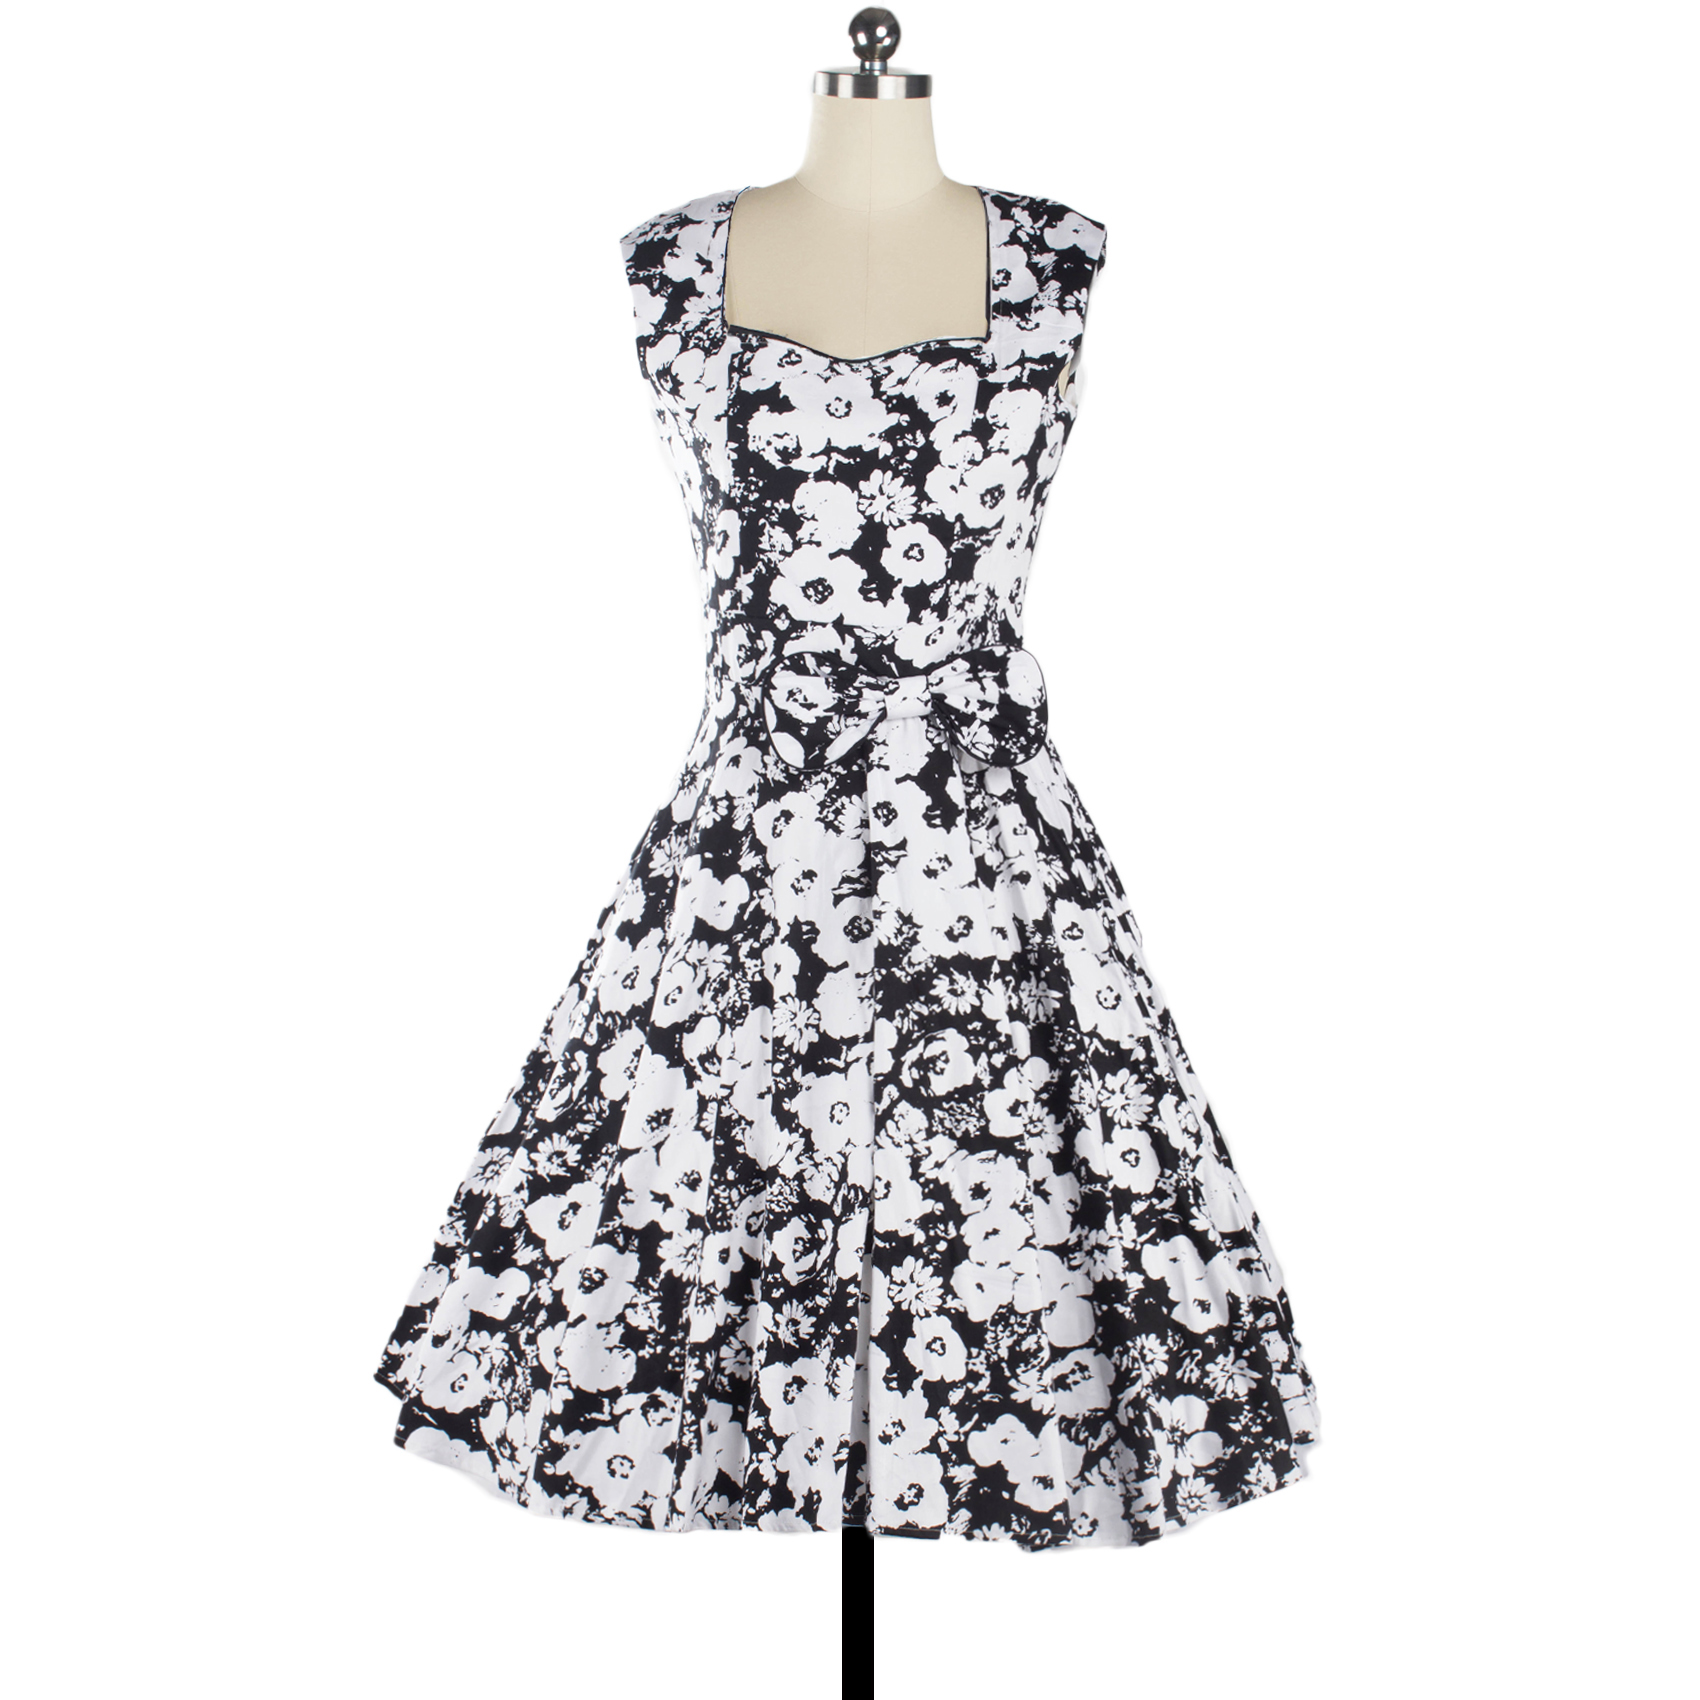 2017 Black And White Floral Elegant Dress Women 50s 60s Swing Retro